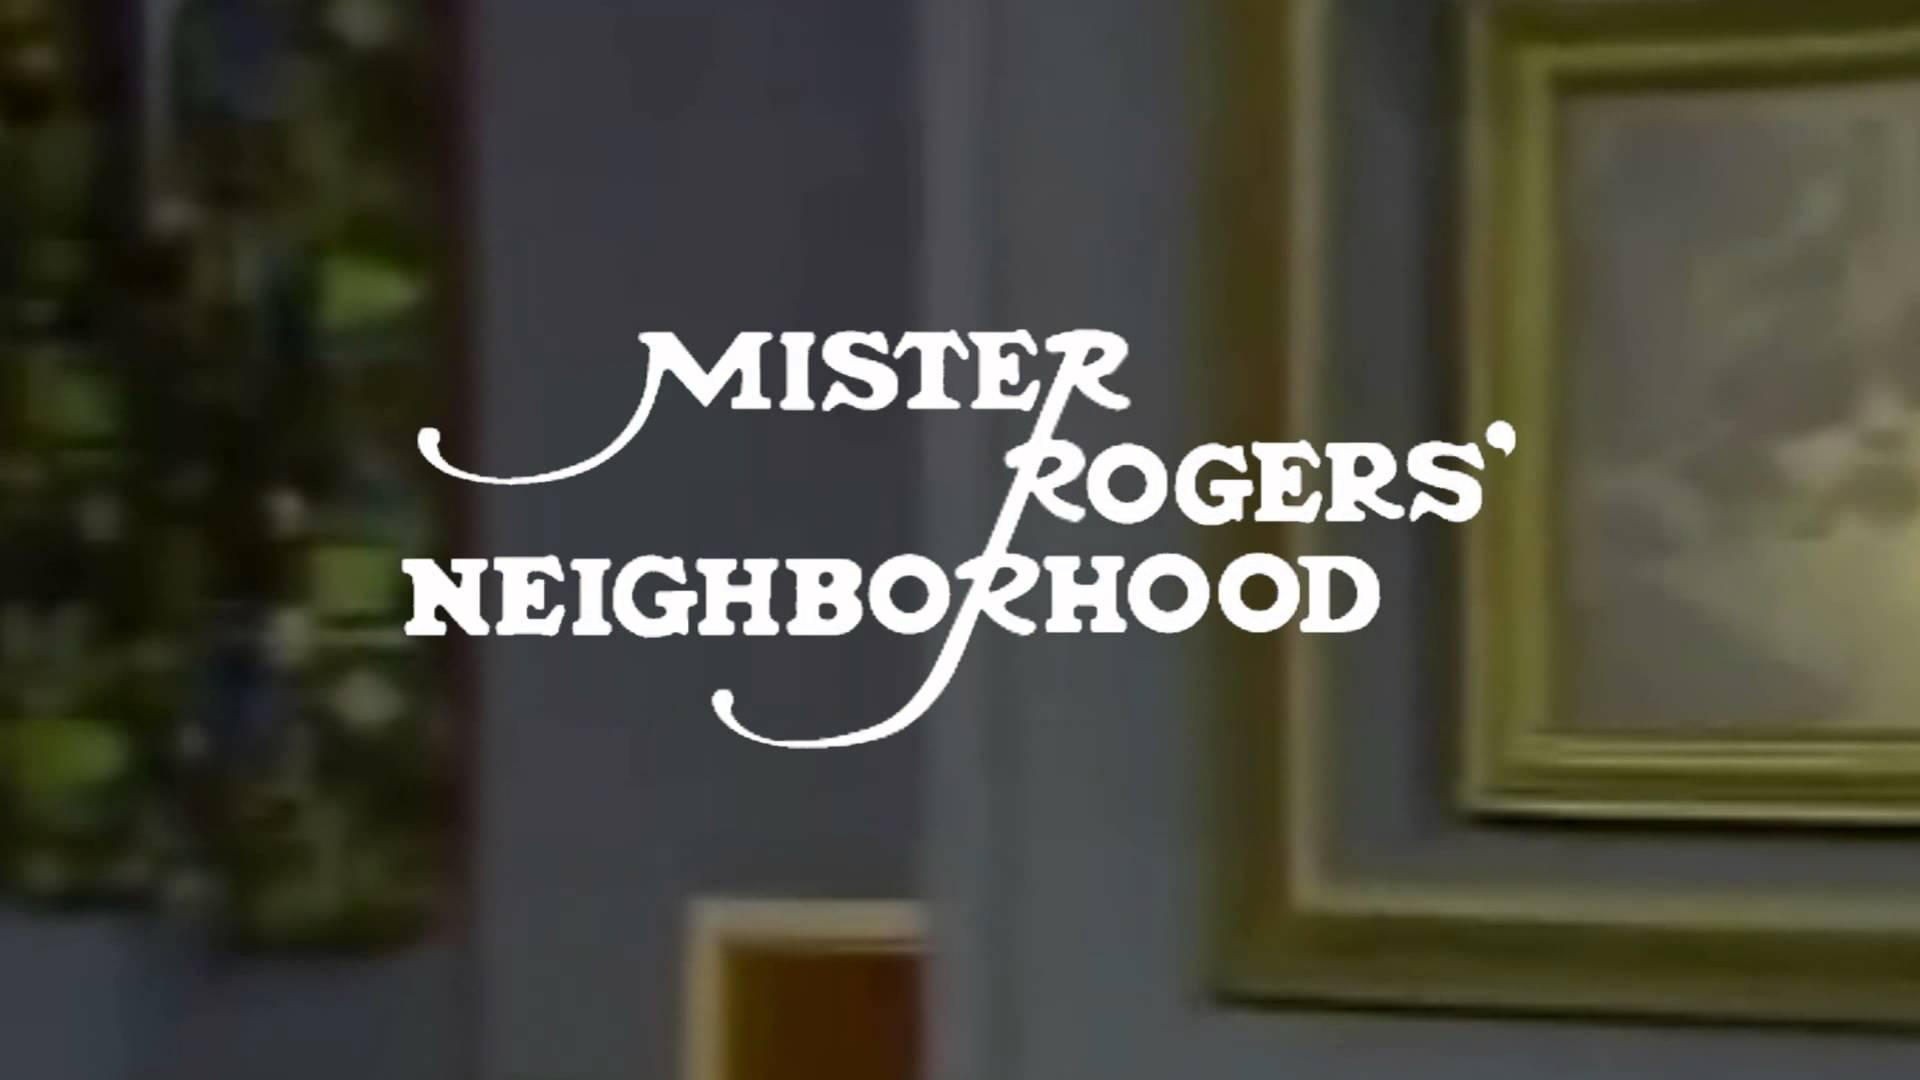 See Tom Hanks as Mister Rogers!